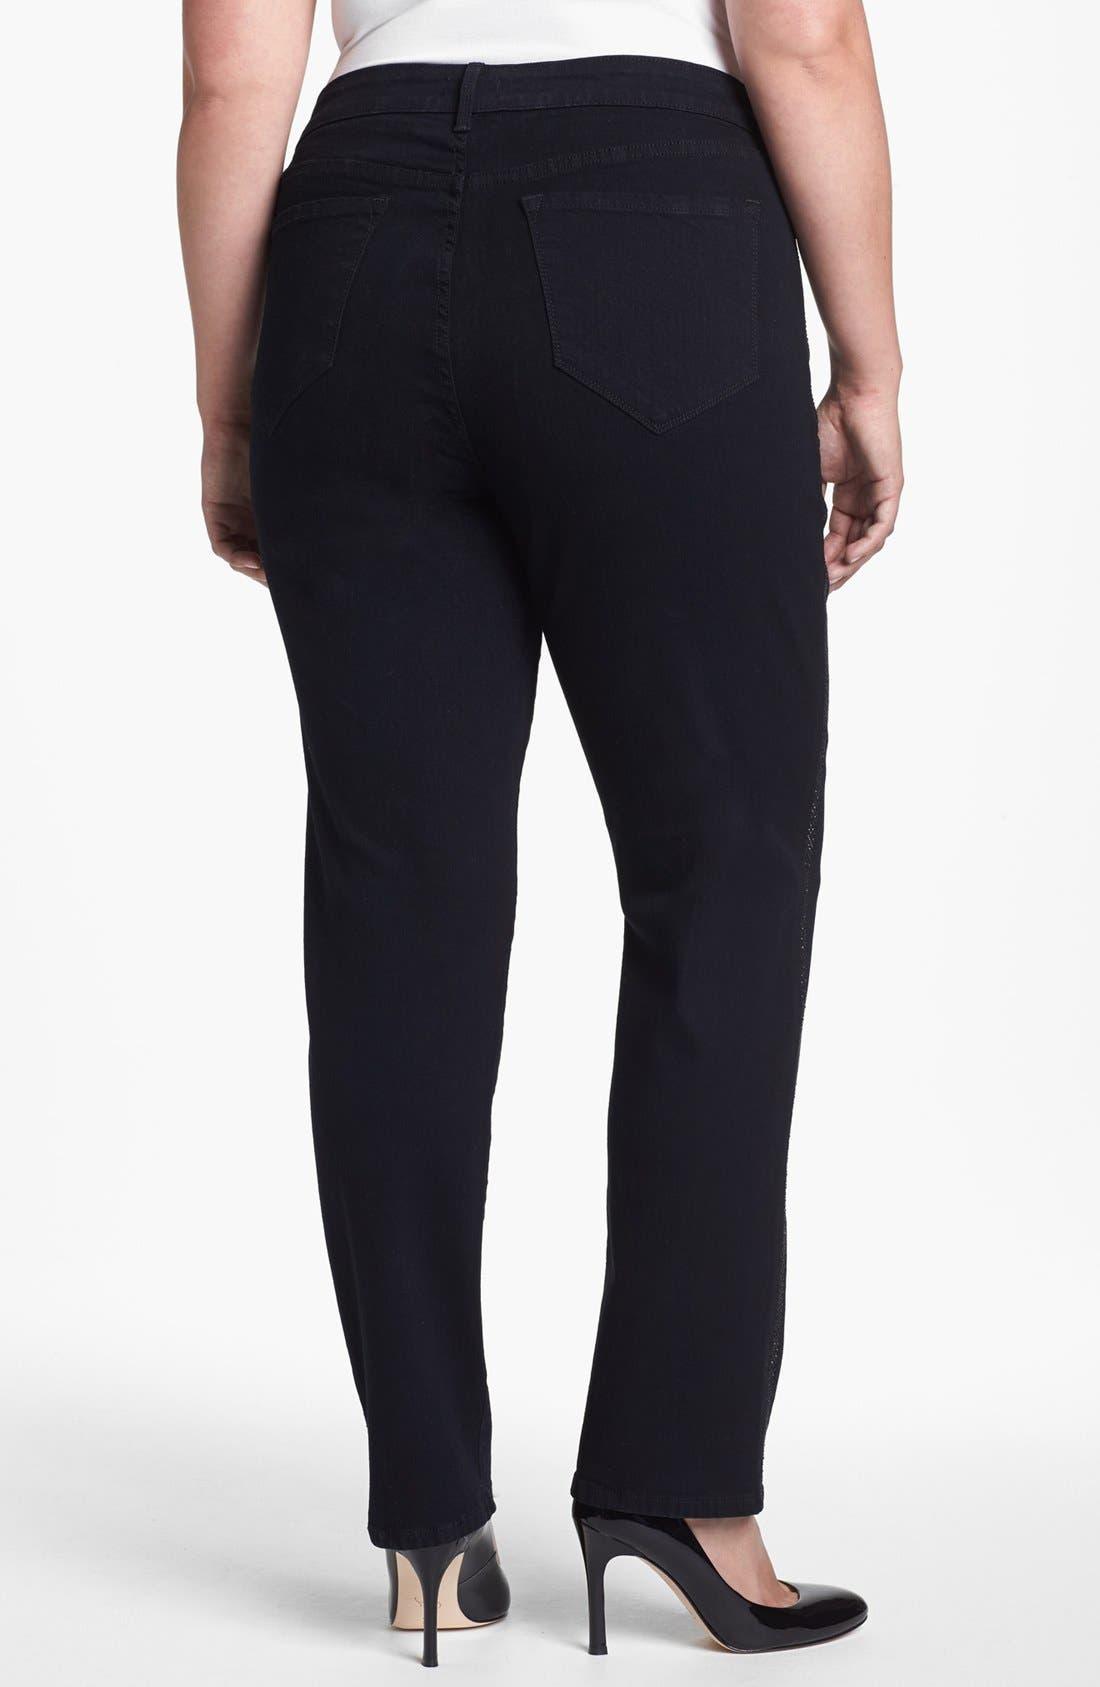 Alternate Image 2  - NYDJ 'Sheri' Embellished Trim Stretch Skinny Jeans (Plus Size)